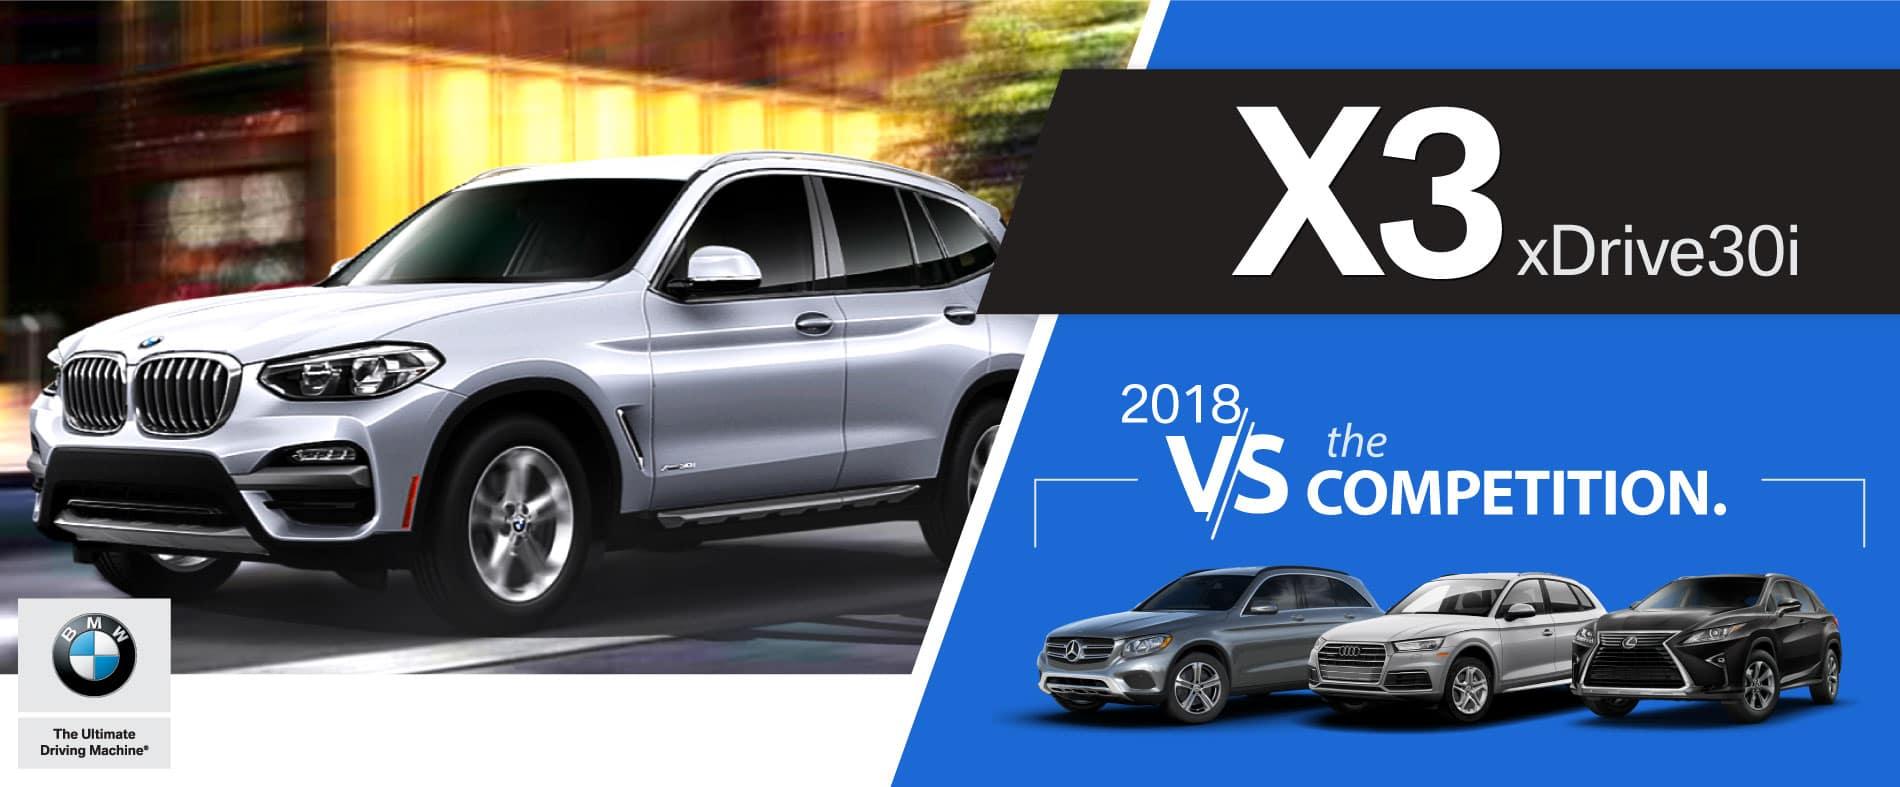 2018 Bmw X3 Model Comparisons Bmw Of San Francisco